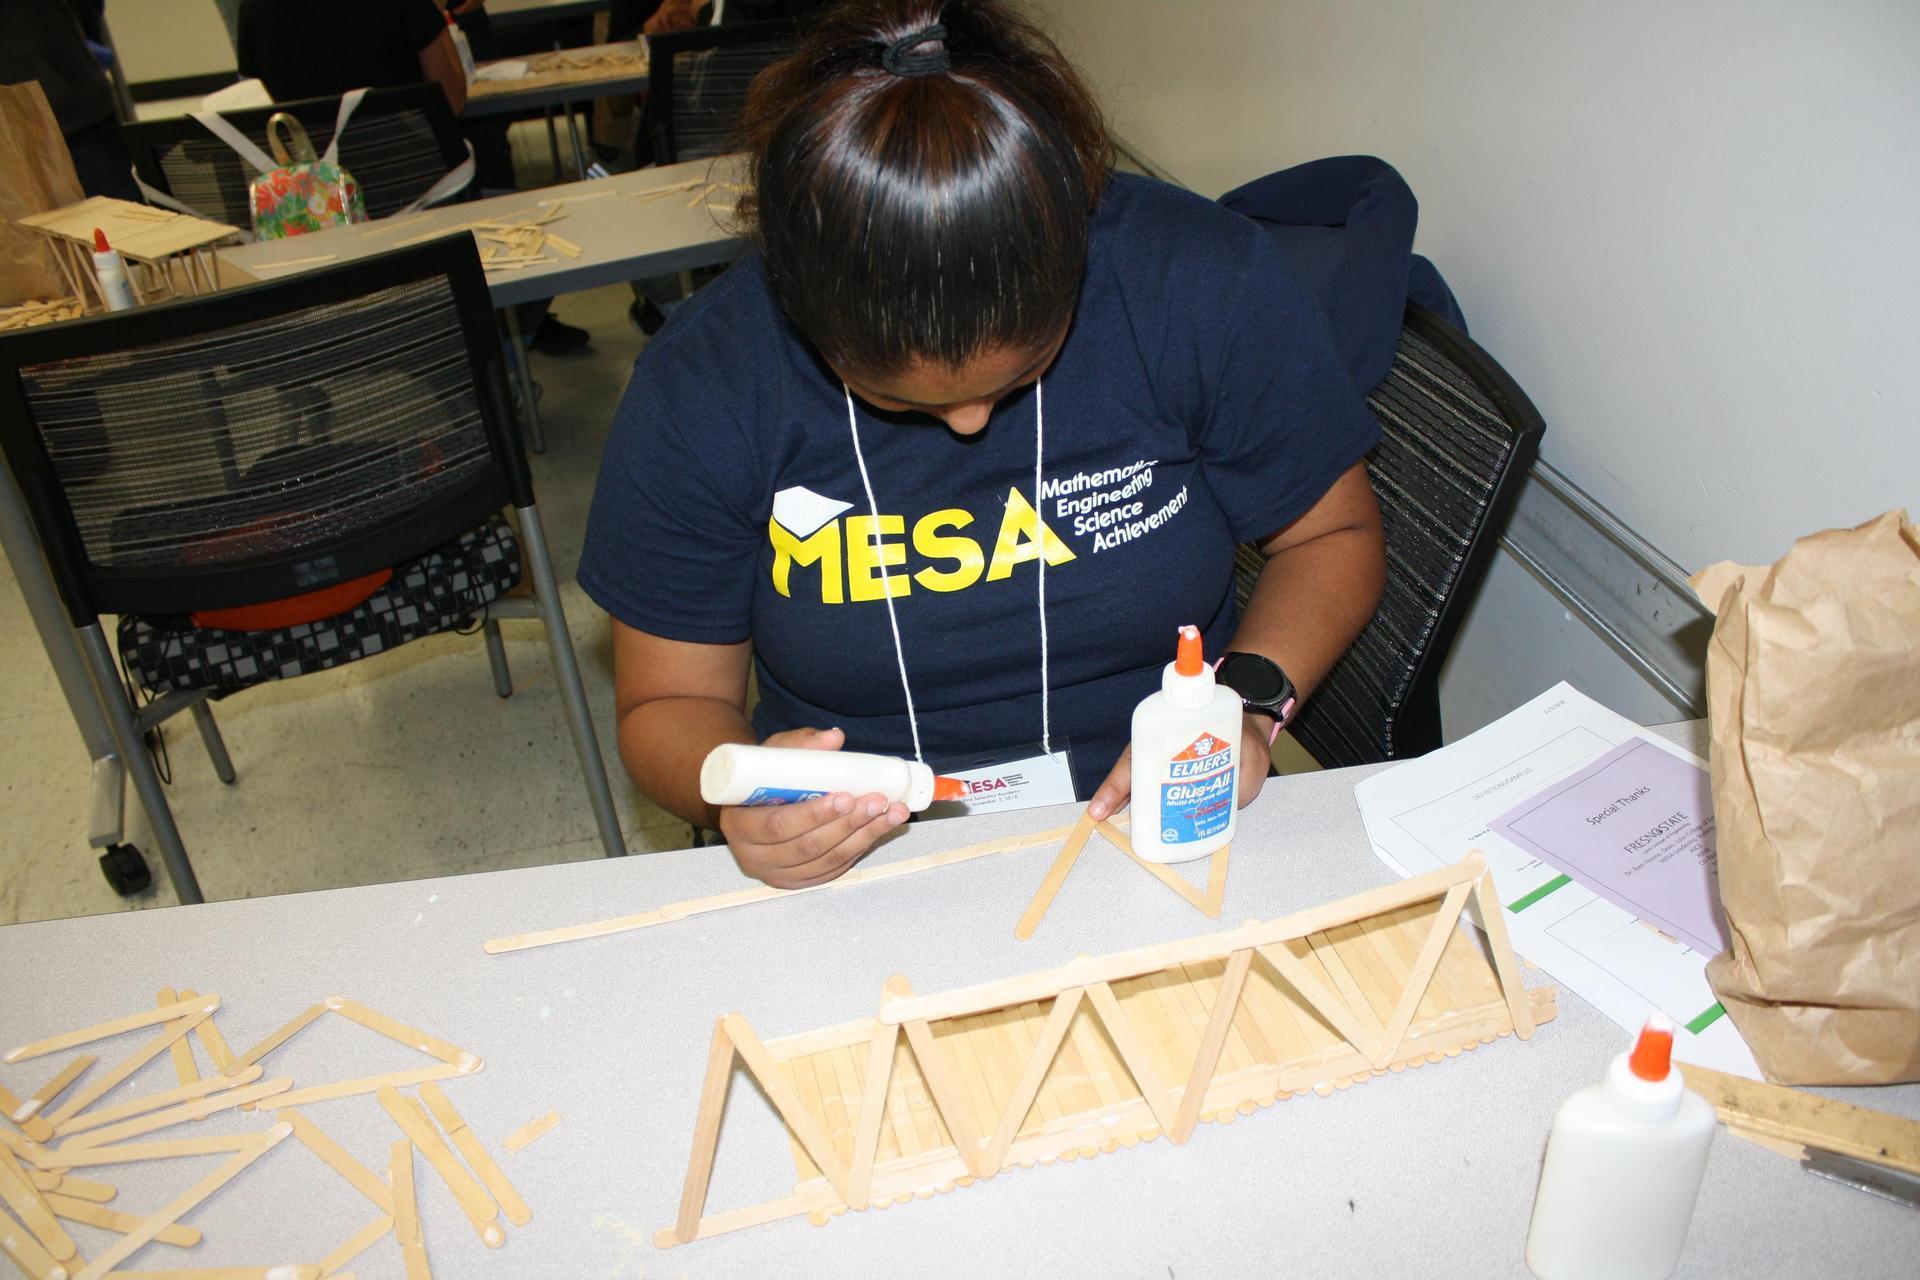 Mathematics, Engineering, Science Achievement